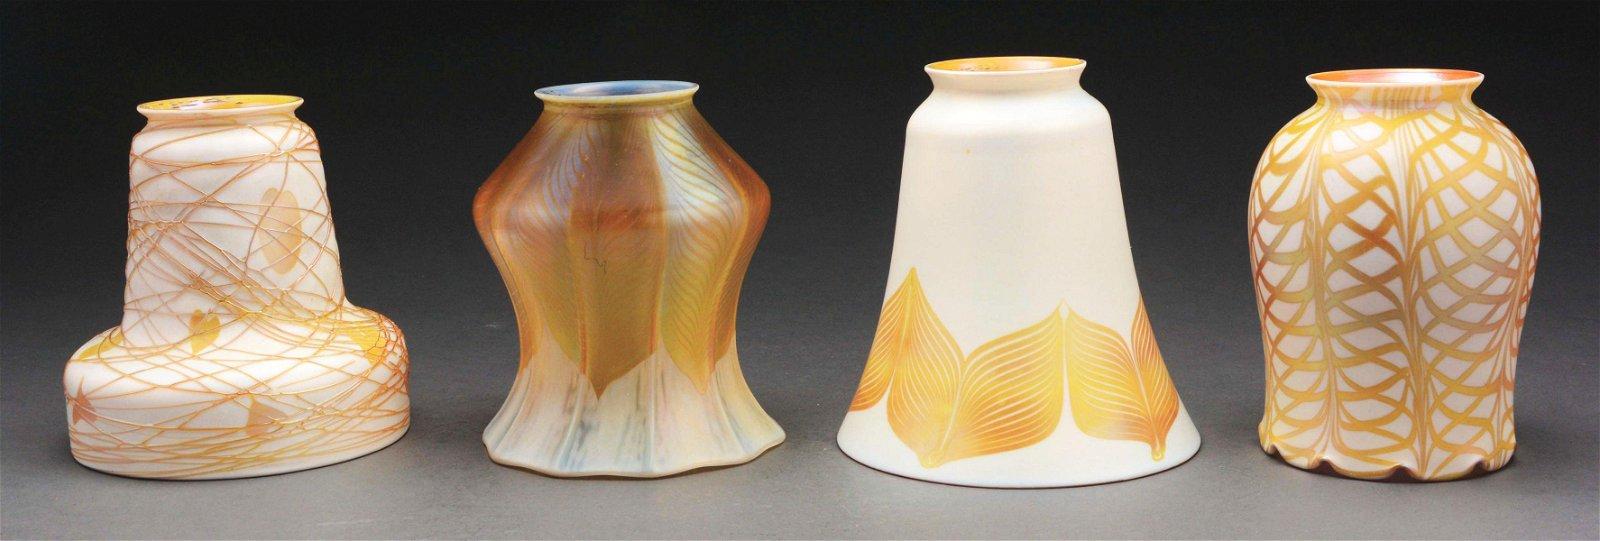 LOT OF 4: QUEZAL ART GLASS SHADES.